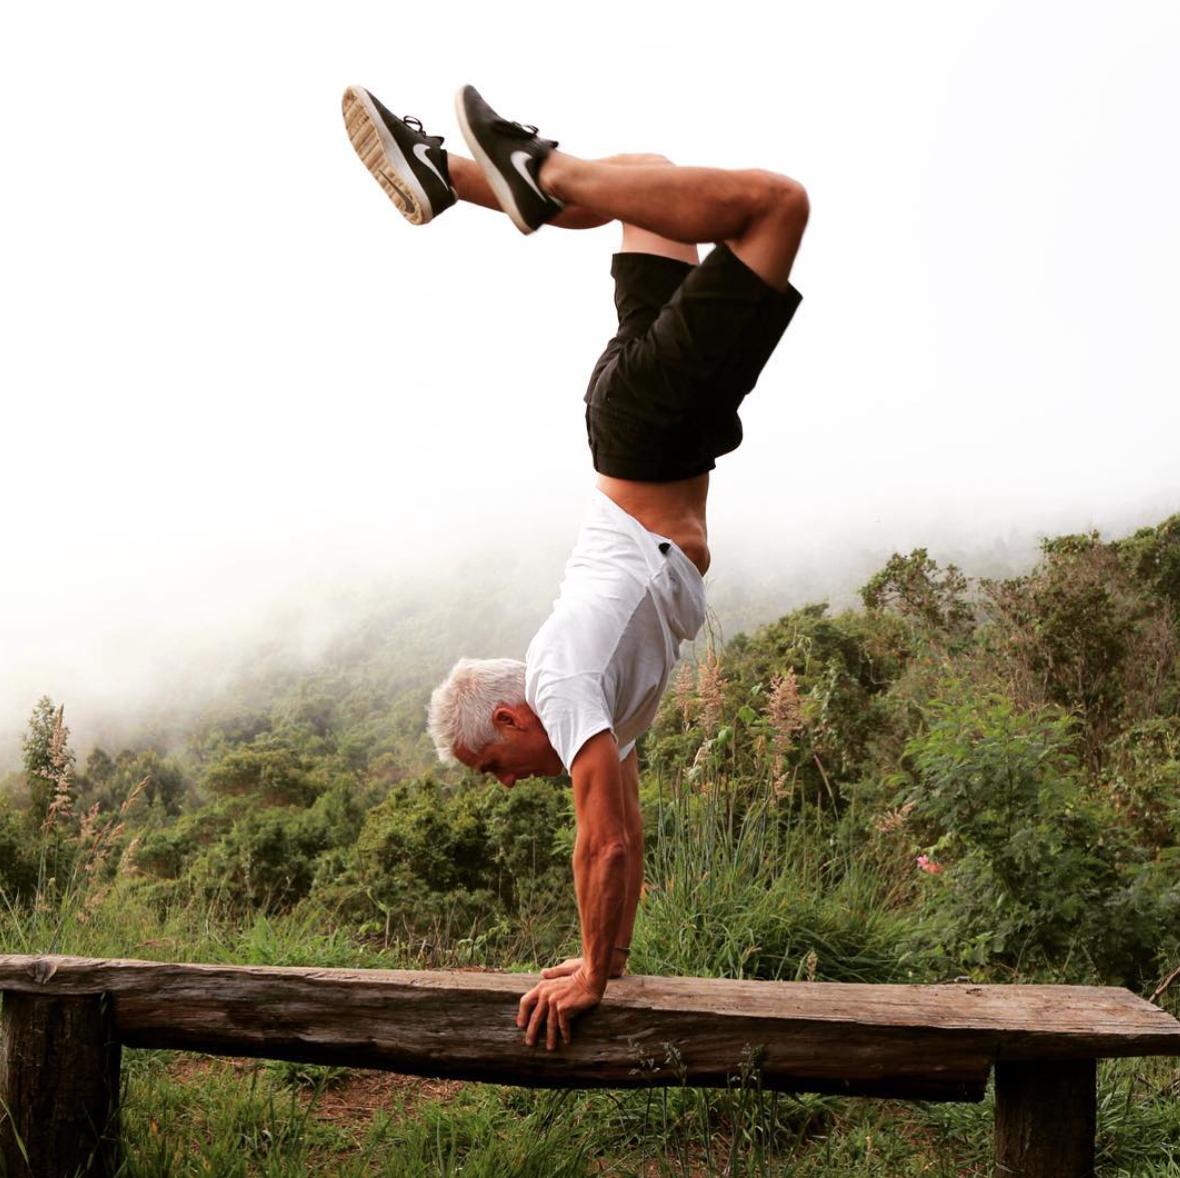 Pete Cabrina  Surfer / Kiter / Artist / Musician   Follow Pete on Instagram